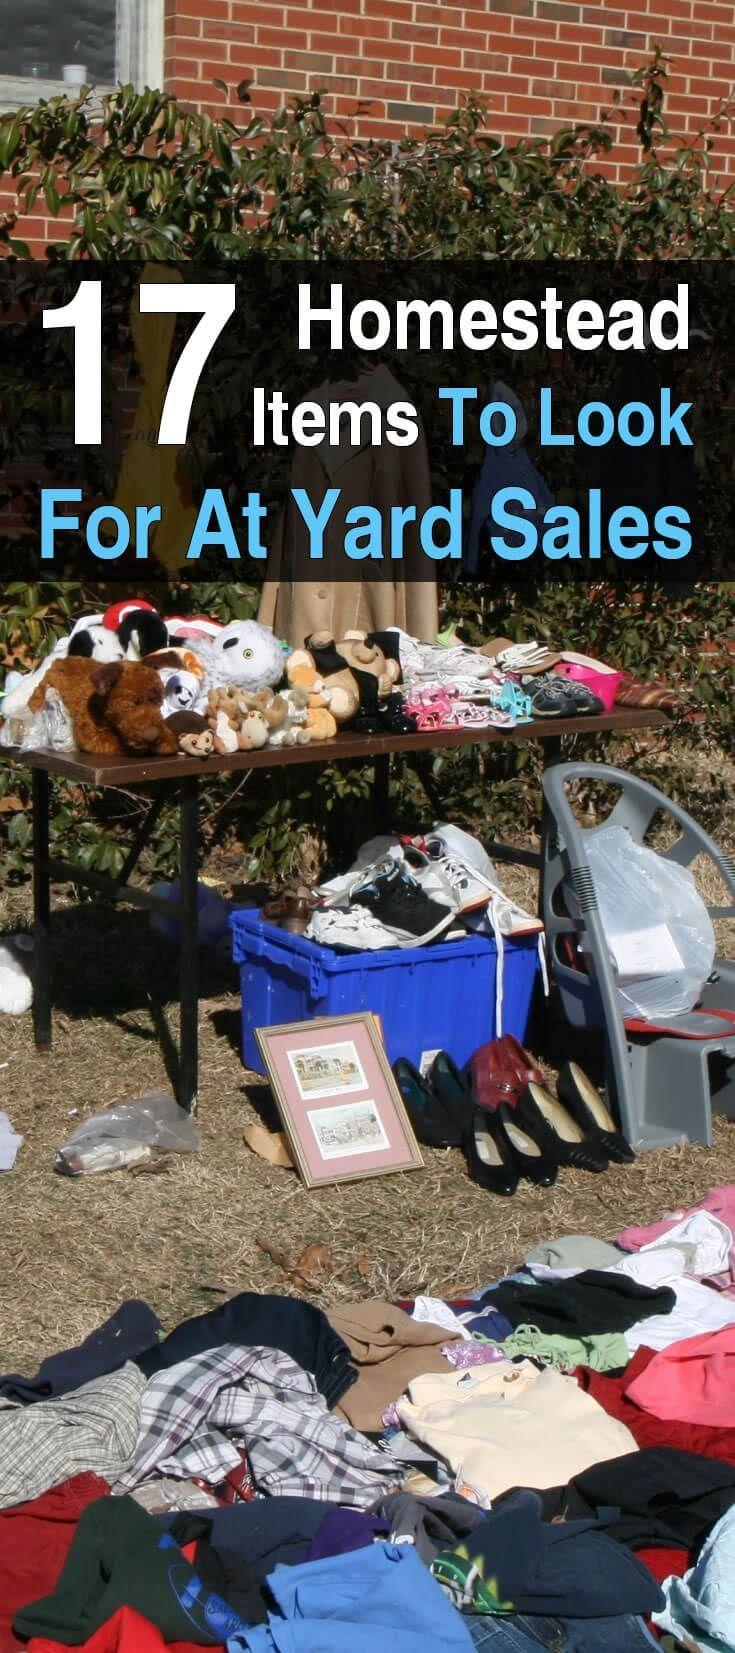 best 25 garage sale pricing ideas on pinterest rummage sales near me yard sale and yard. Black Bedroom Furniture Sets. Home Design Ideas